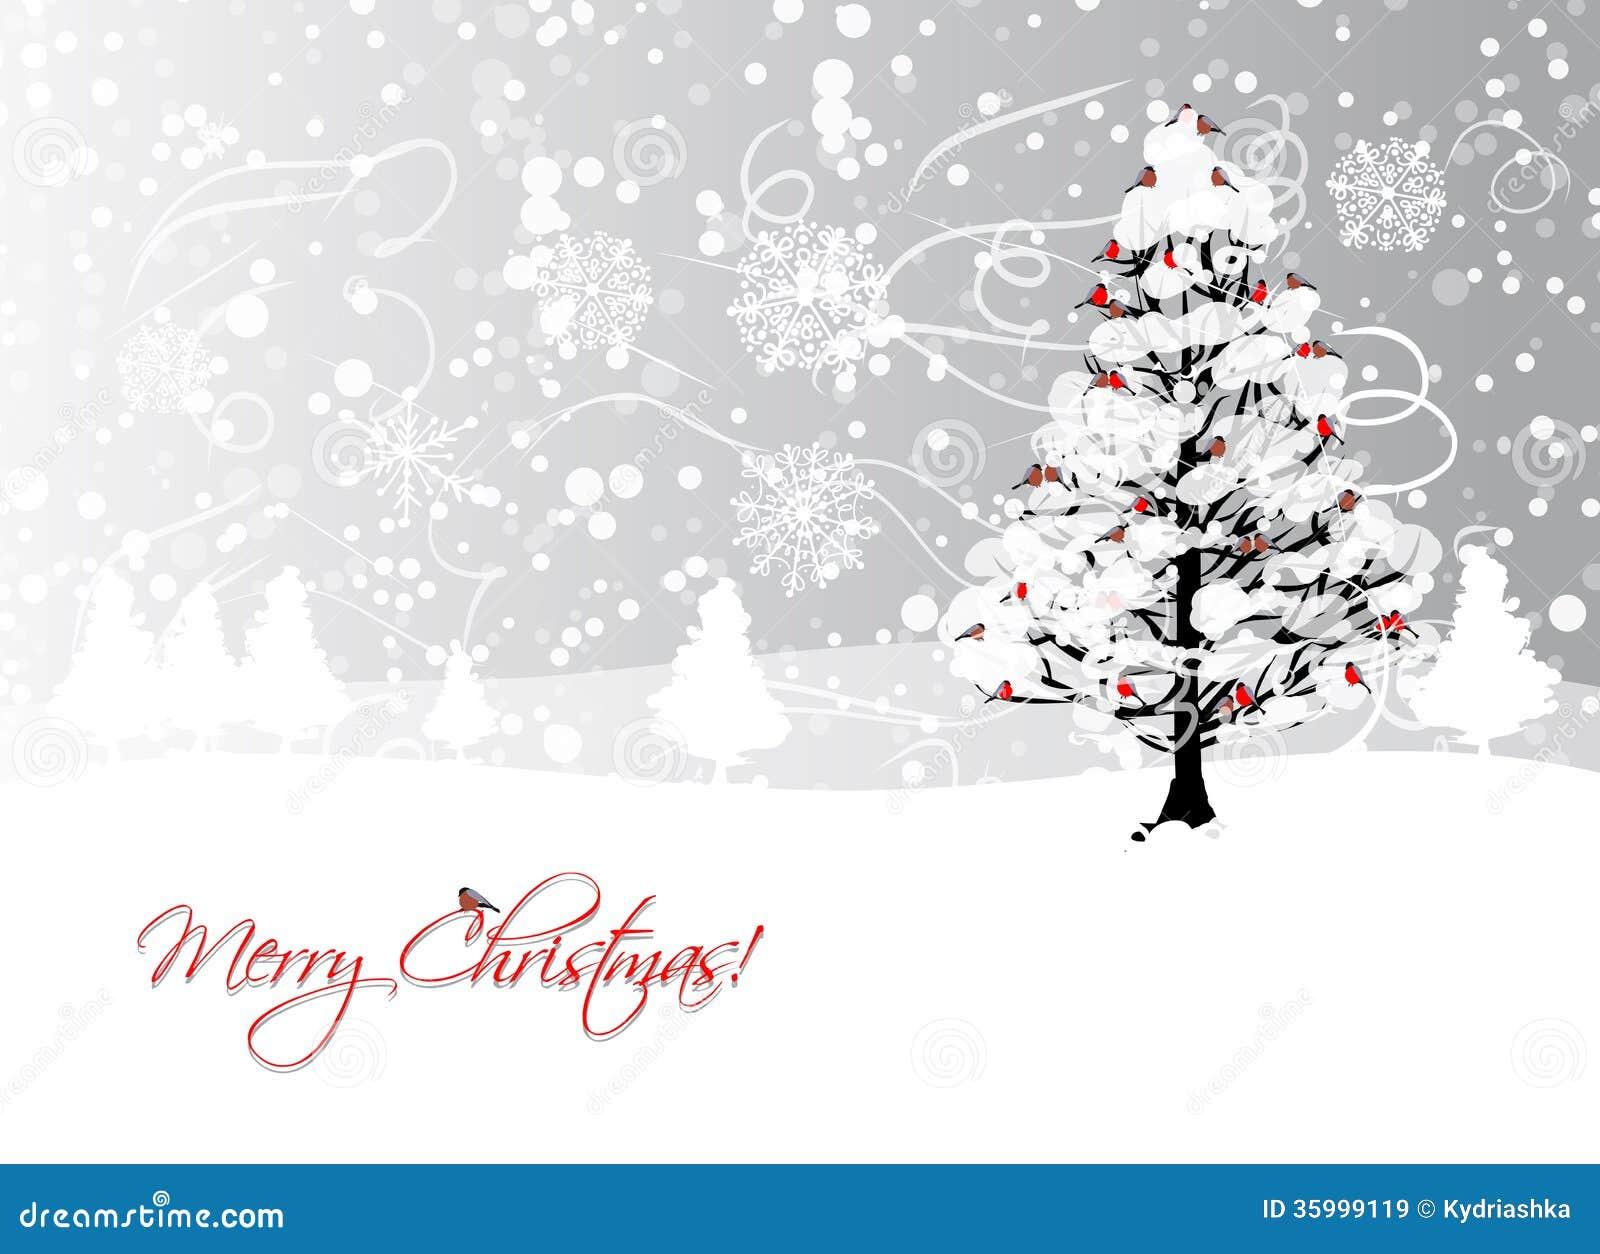 christmas card design free - Paso.evolist.co